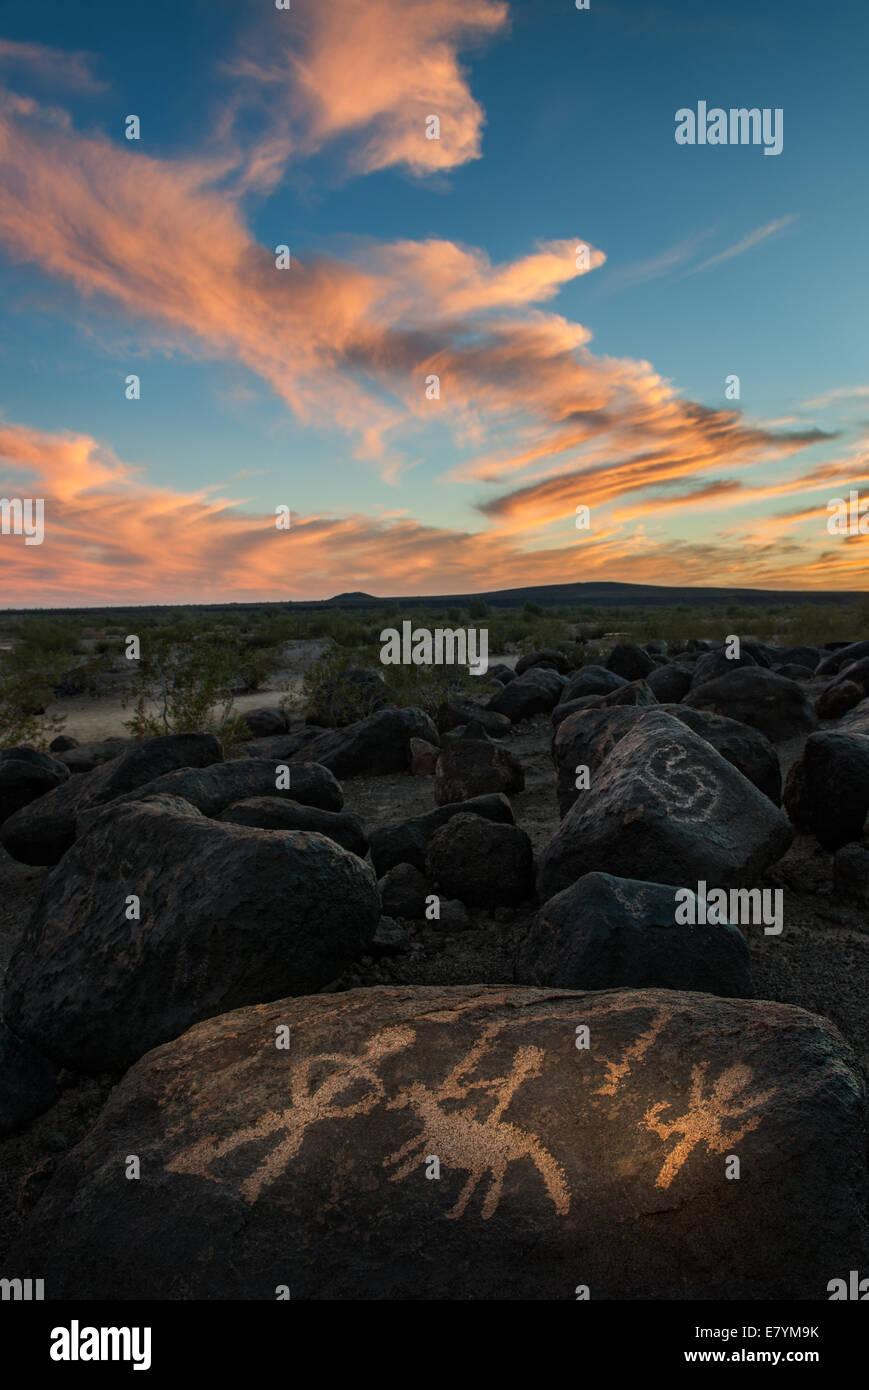 Native rock carvings beneath a colorful sunset near Gila Bend, Arizona. - Stock Image